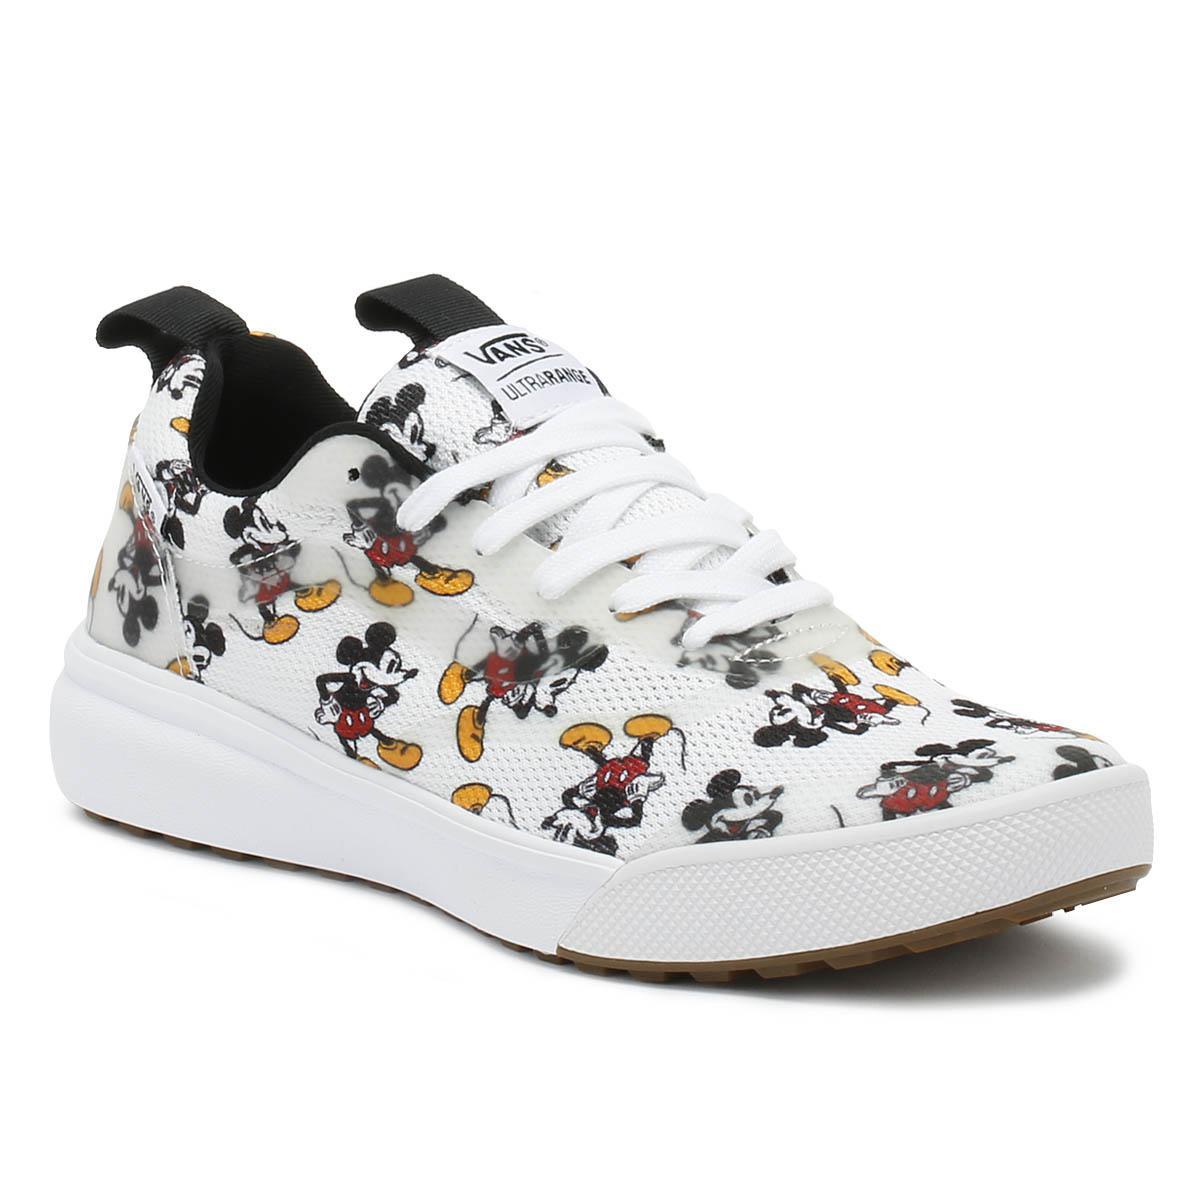 f7c0f5d90bde27 Lyst - Vans Disney Ultrarange Rapidweld Mickey Mouse White Trainers ...